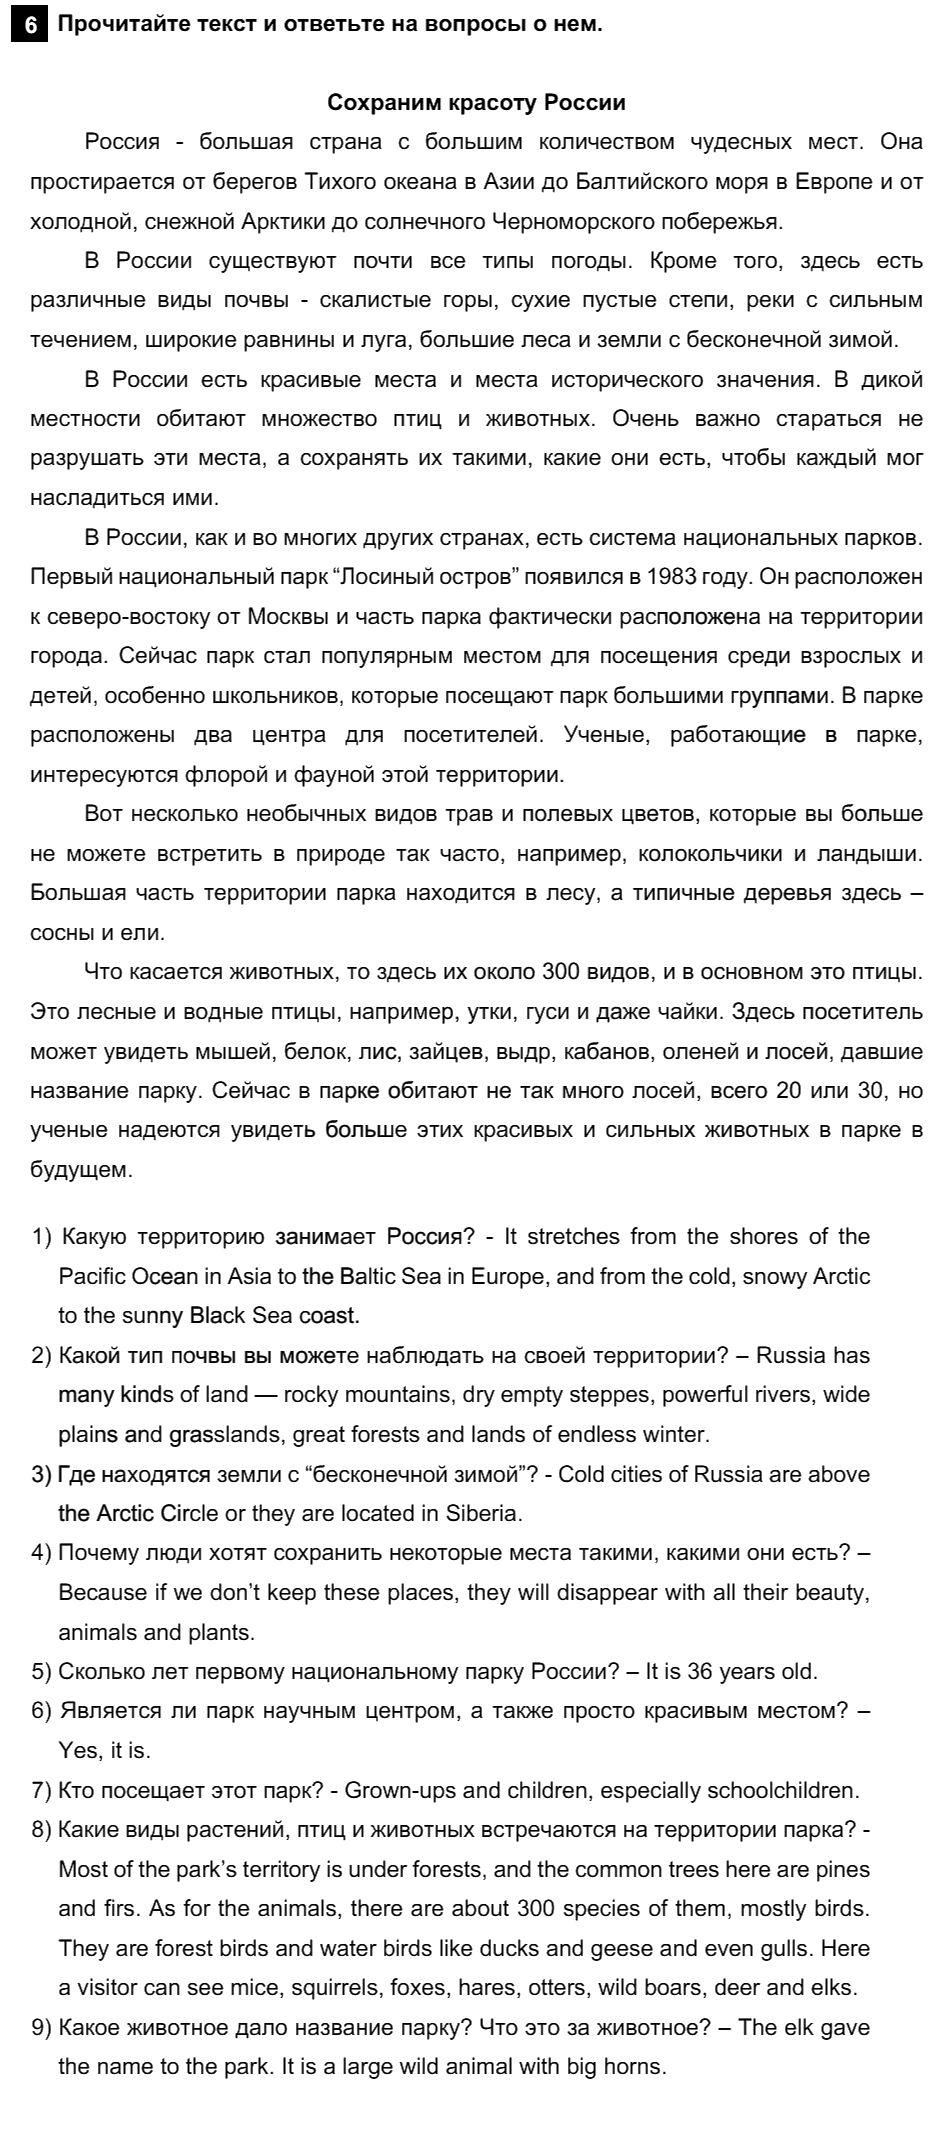 Английский язык 7 класс Афанасьева О. В. Unit 5. Экология / Шаг 1: 6